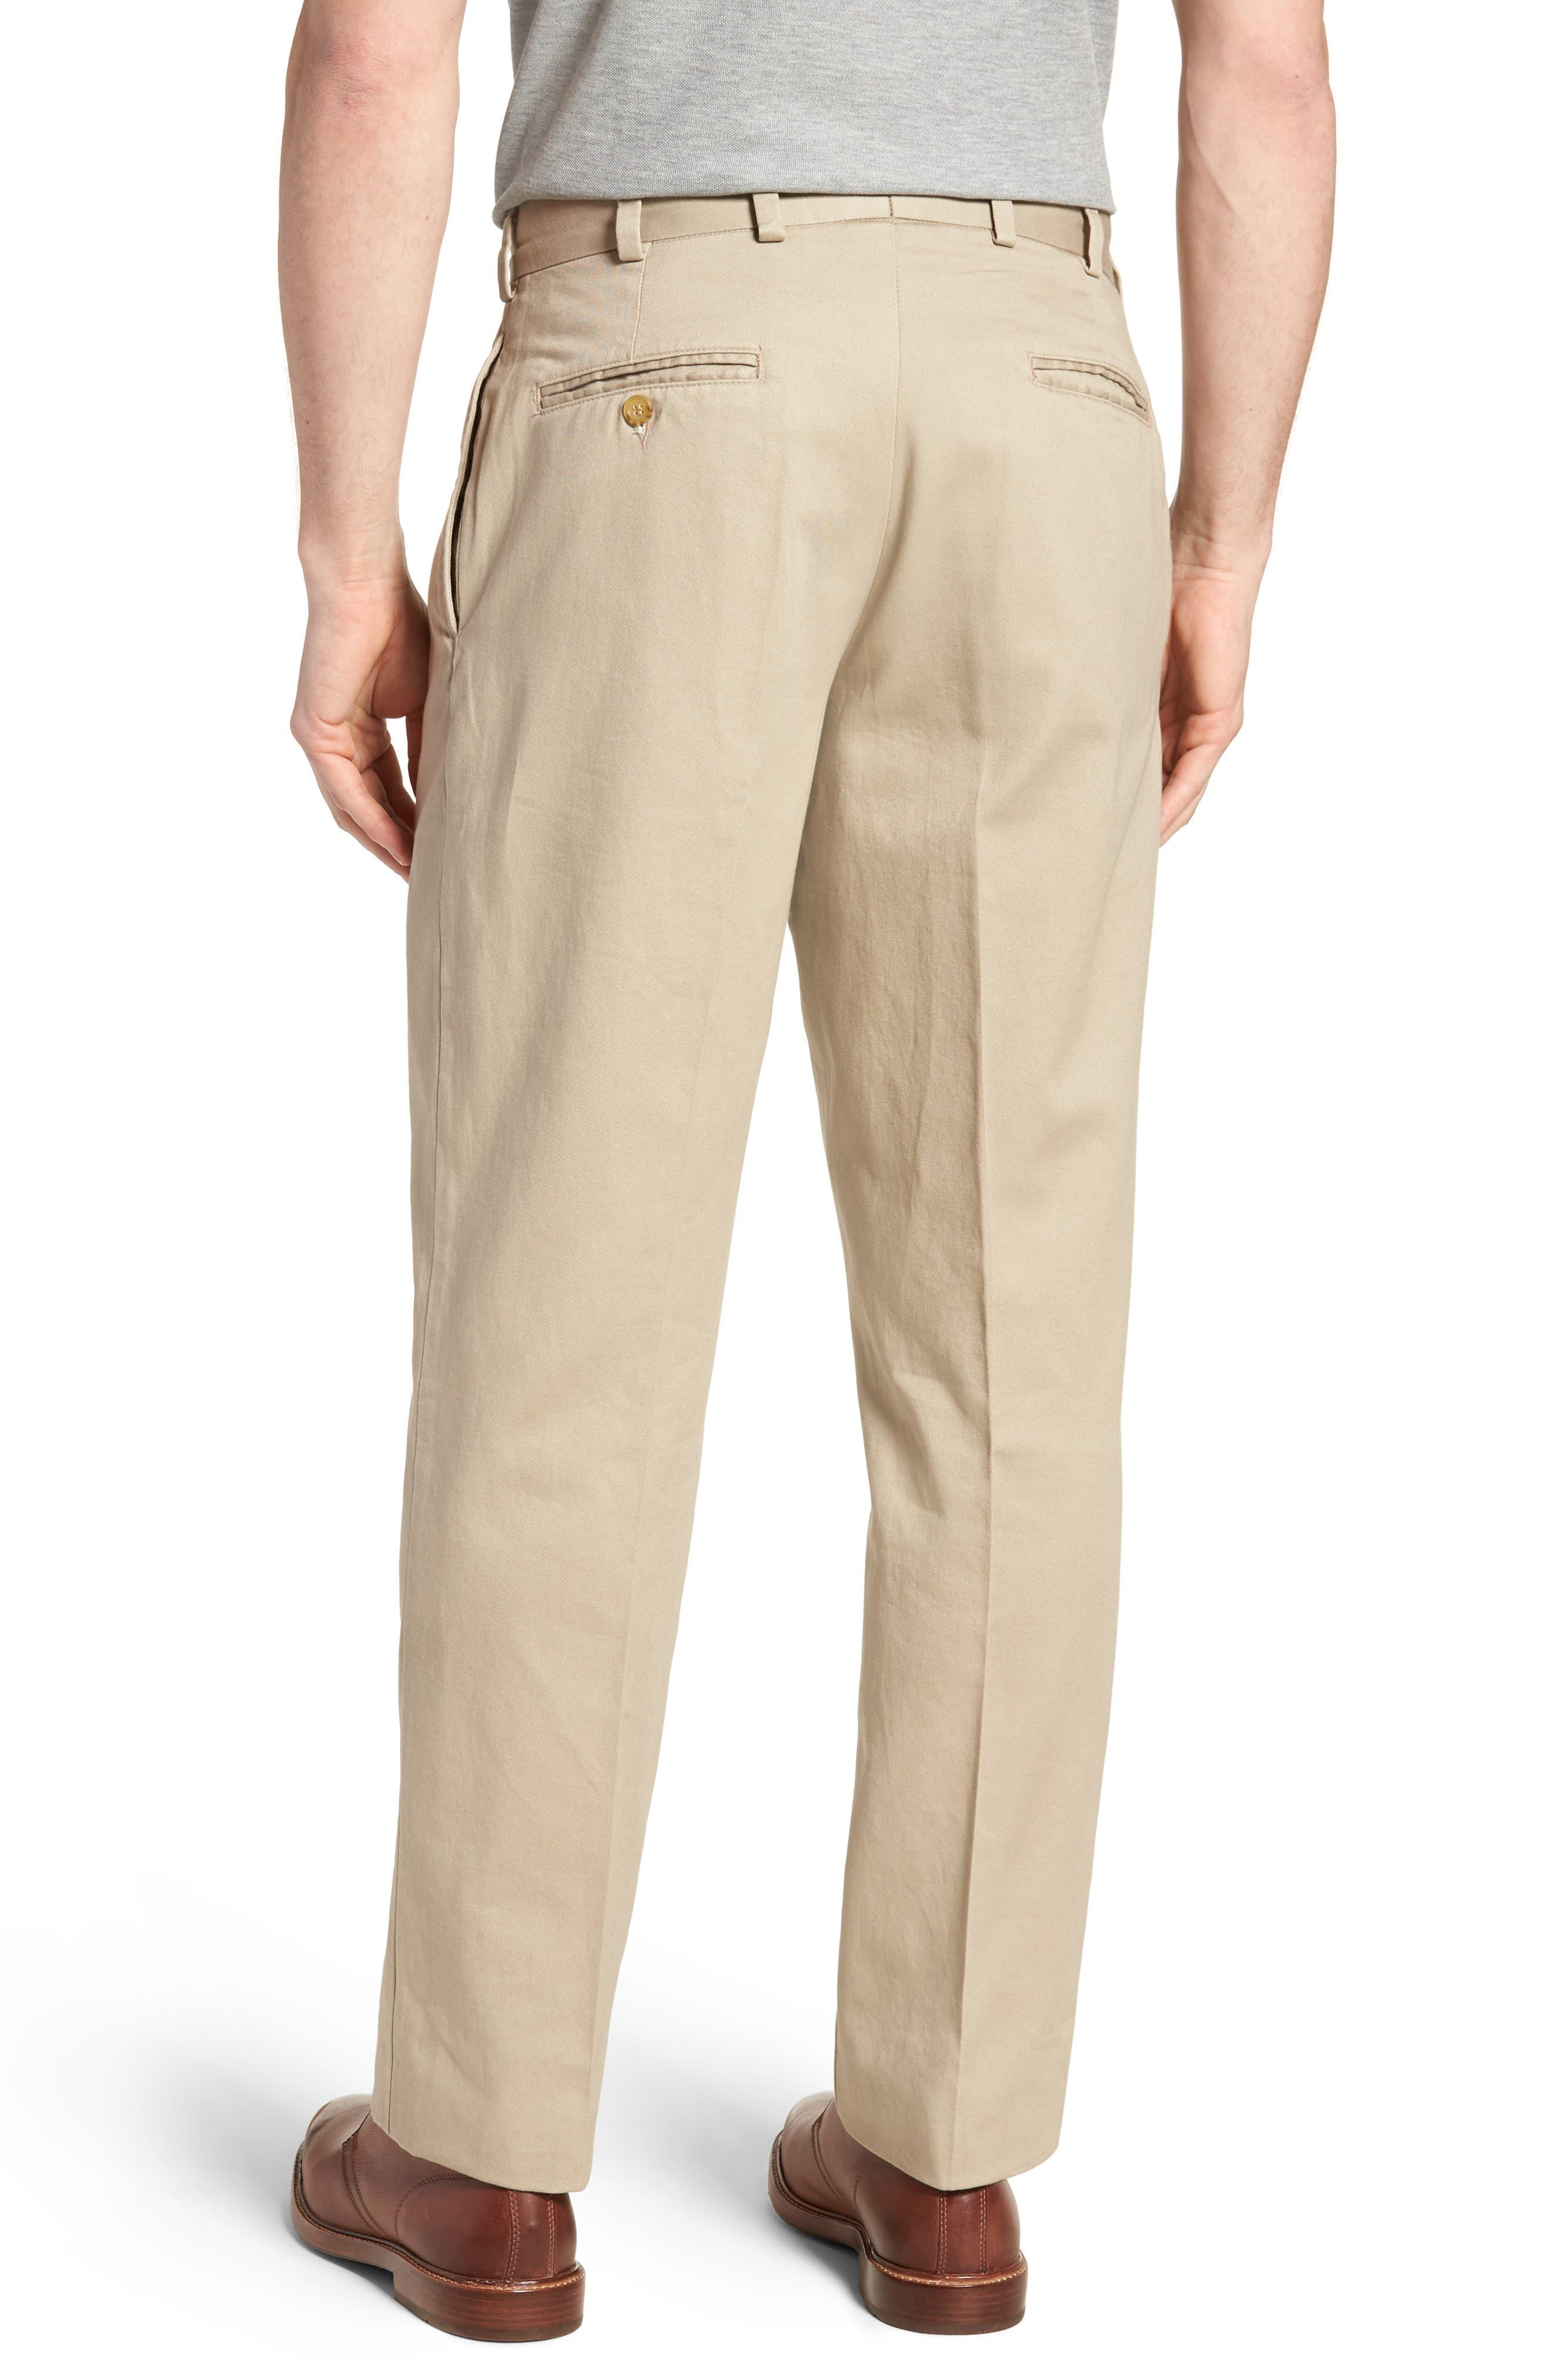 M2 Classic Fit Pleated Vintage Twill Pants,                             Alternate thumbnail 2, color,                             Khaki